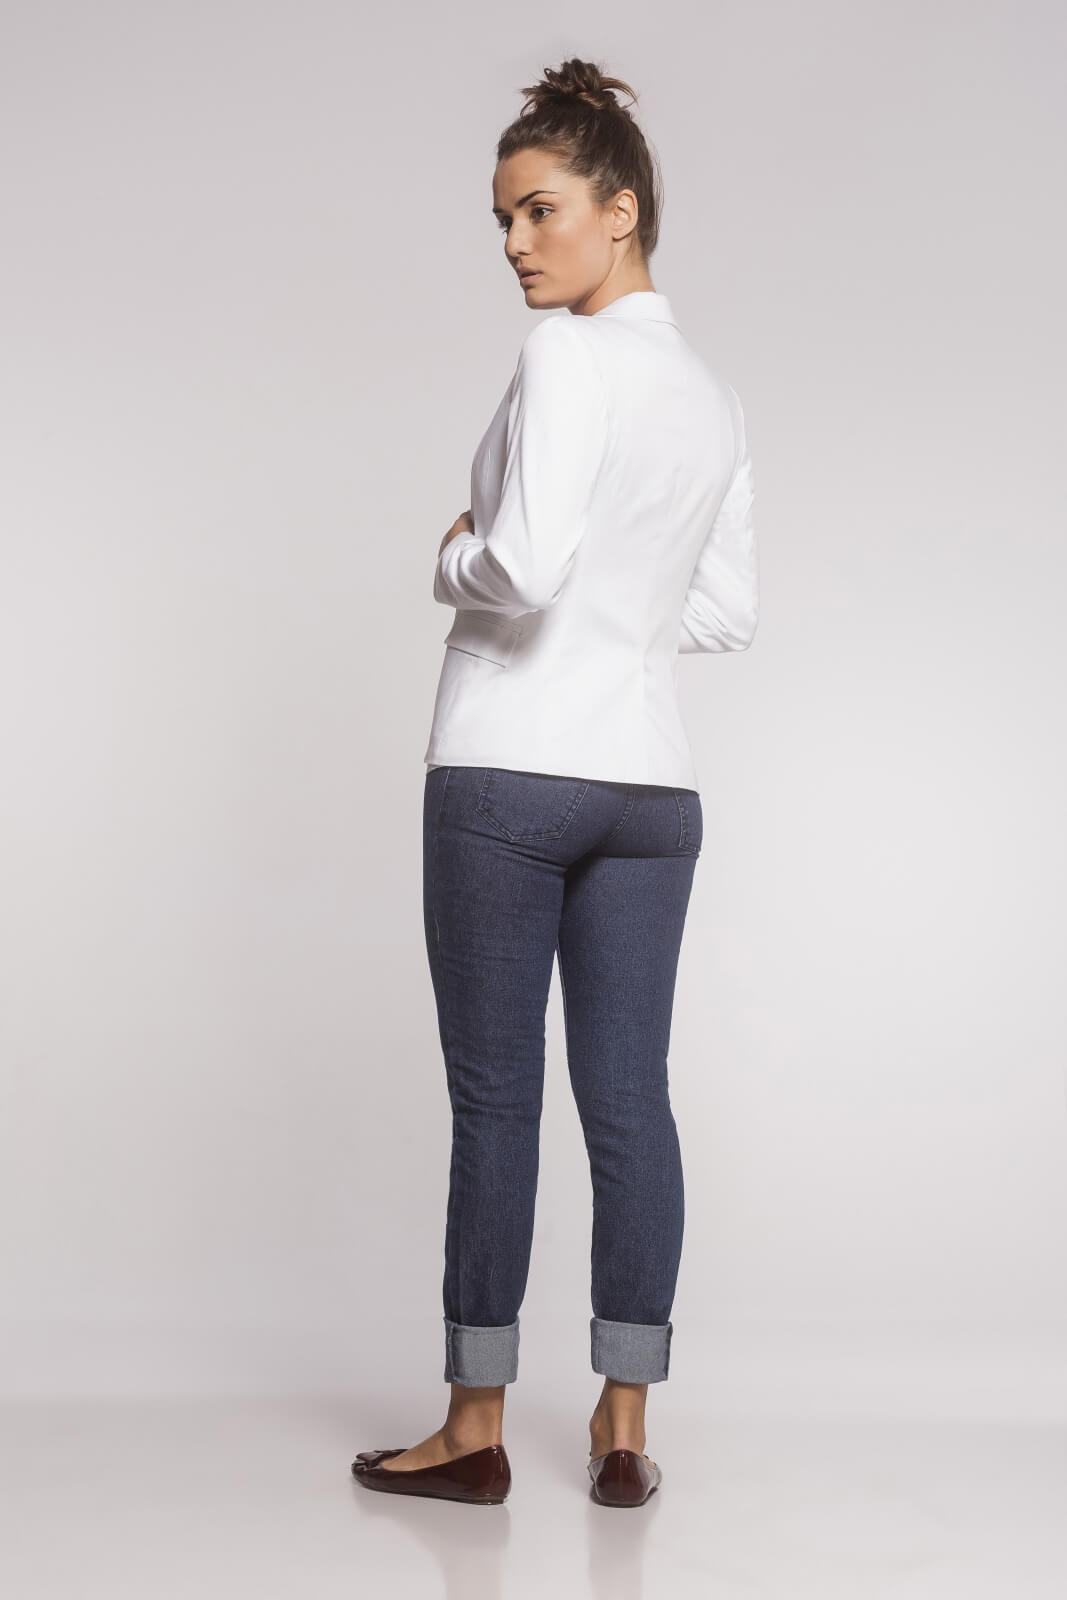 Blazer Feminino Clássico Sarja Branco